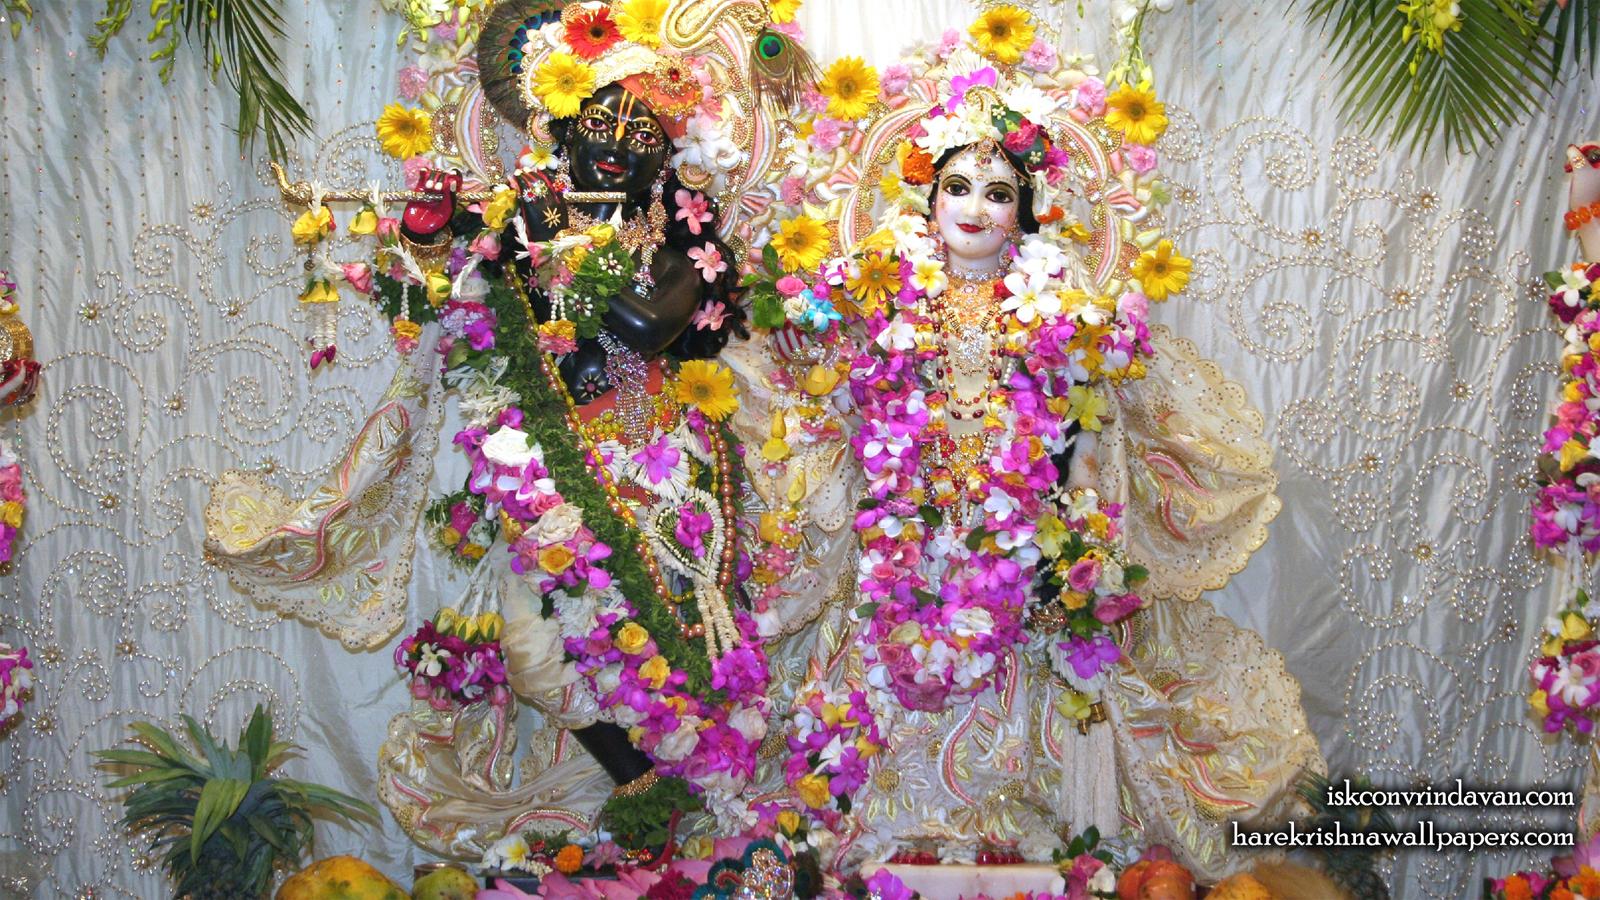 Sri Sri Radha Shyamsundar Wallpaper (006) Size 1600x900 Download